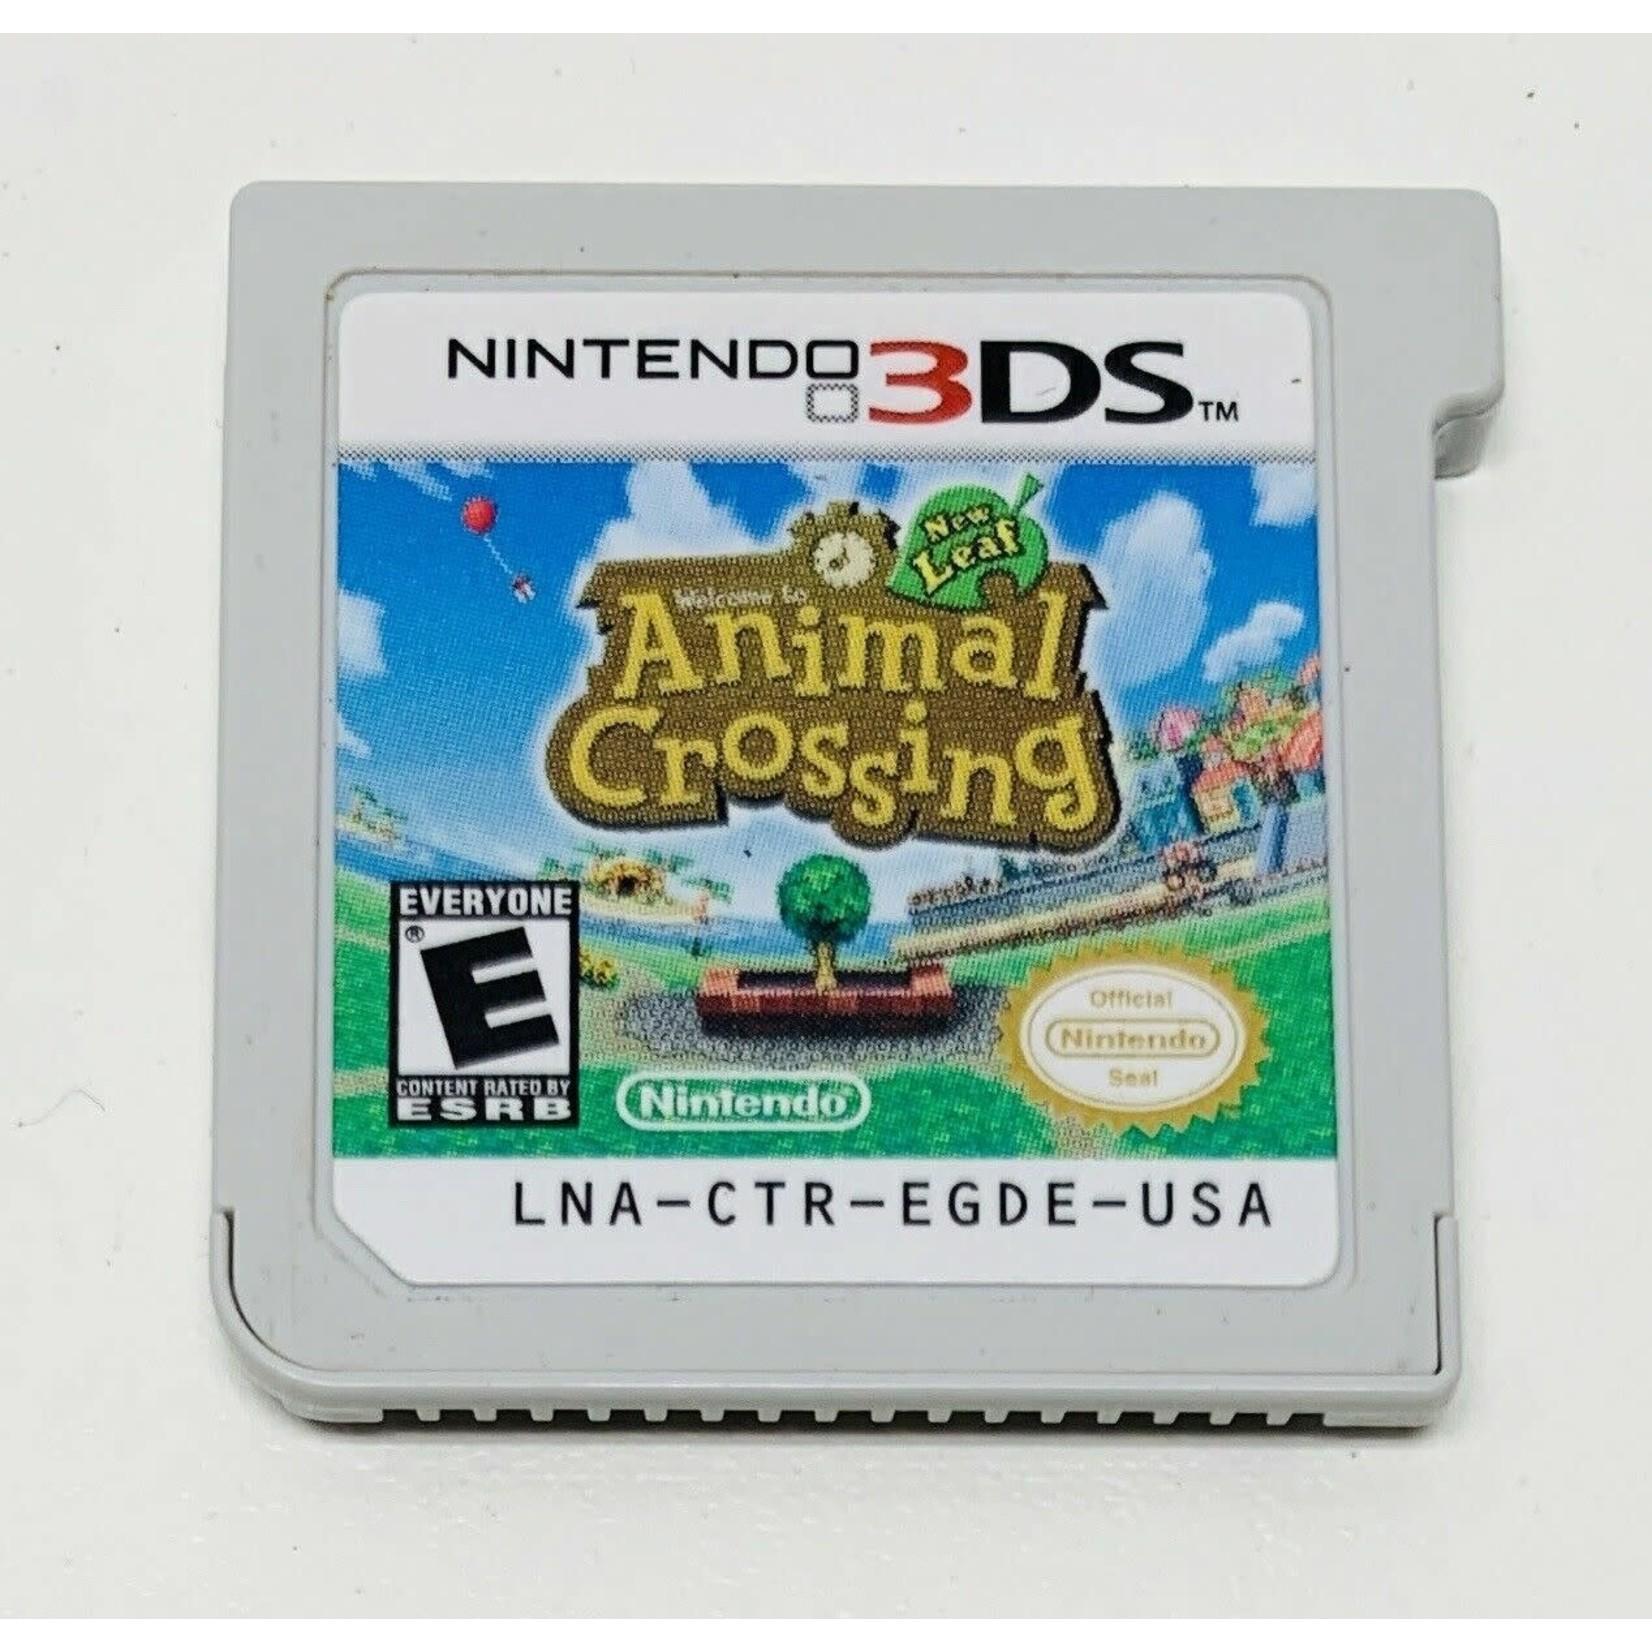 3DSU-Animal Crossing:New Leaf (Chip Only)